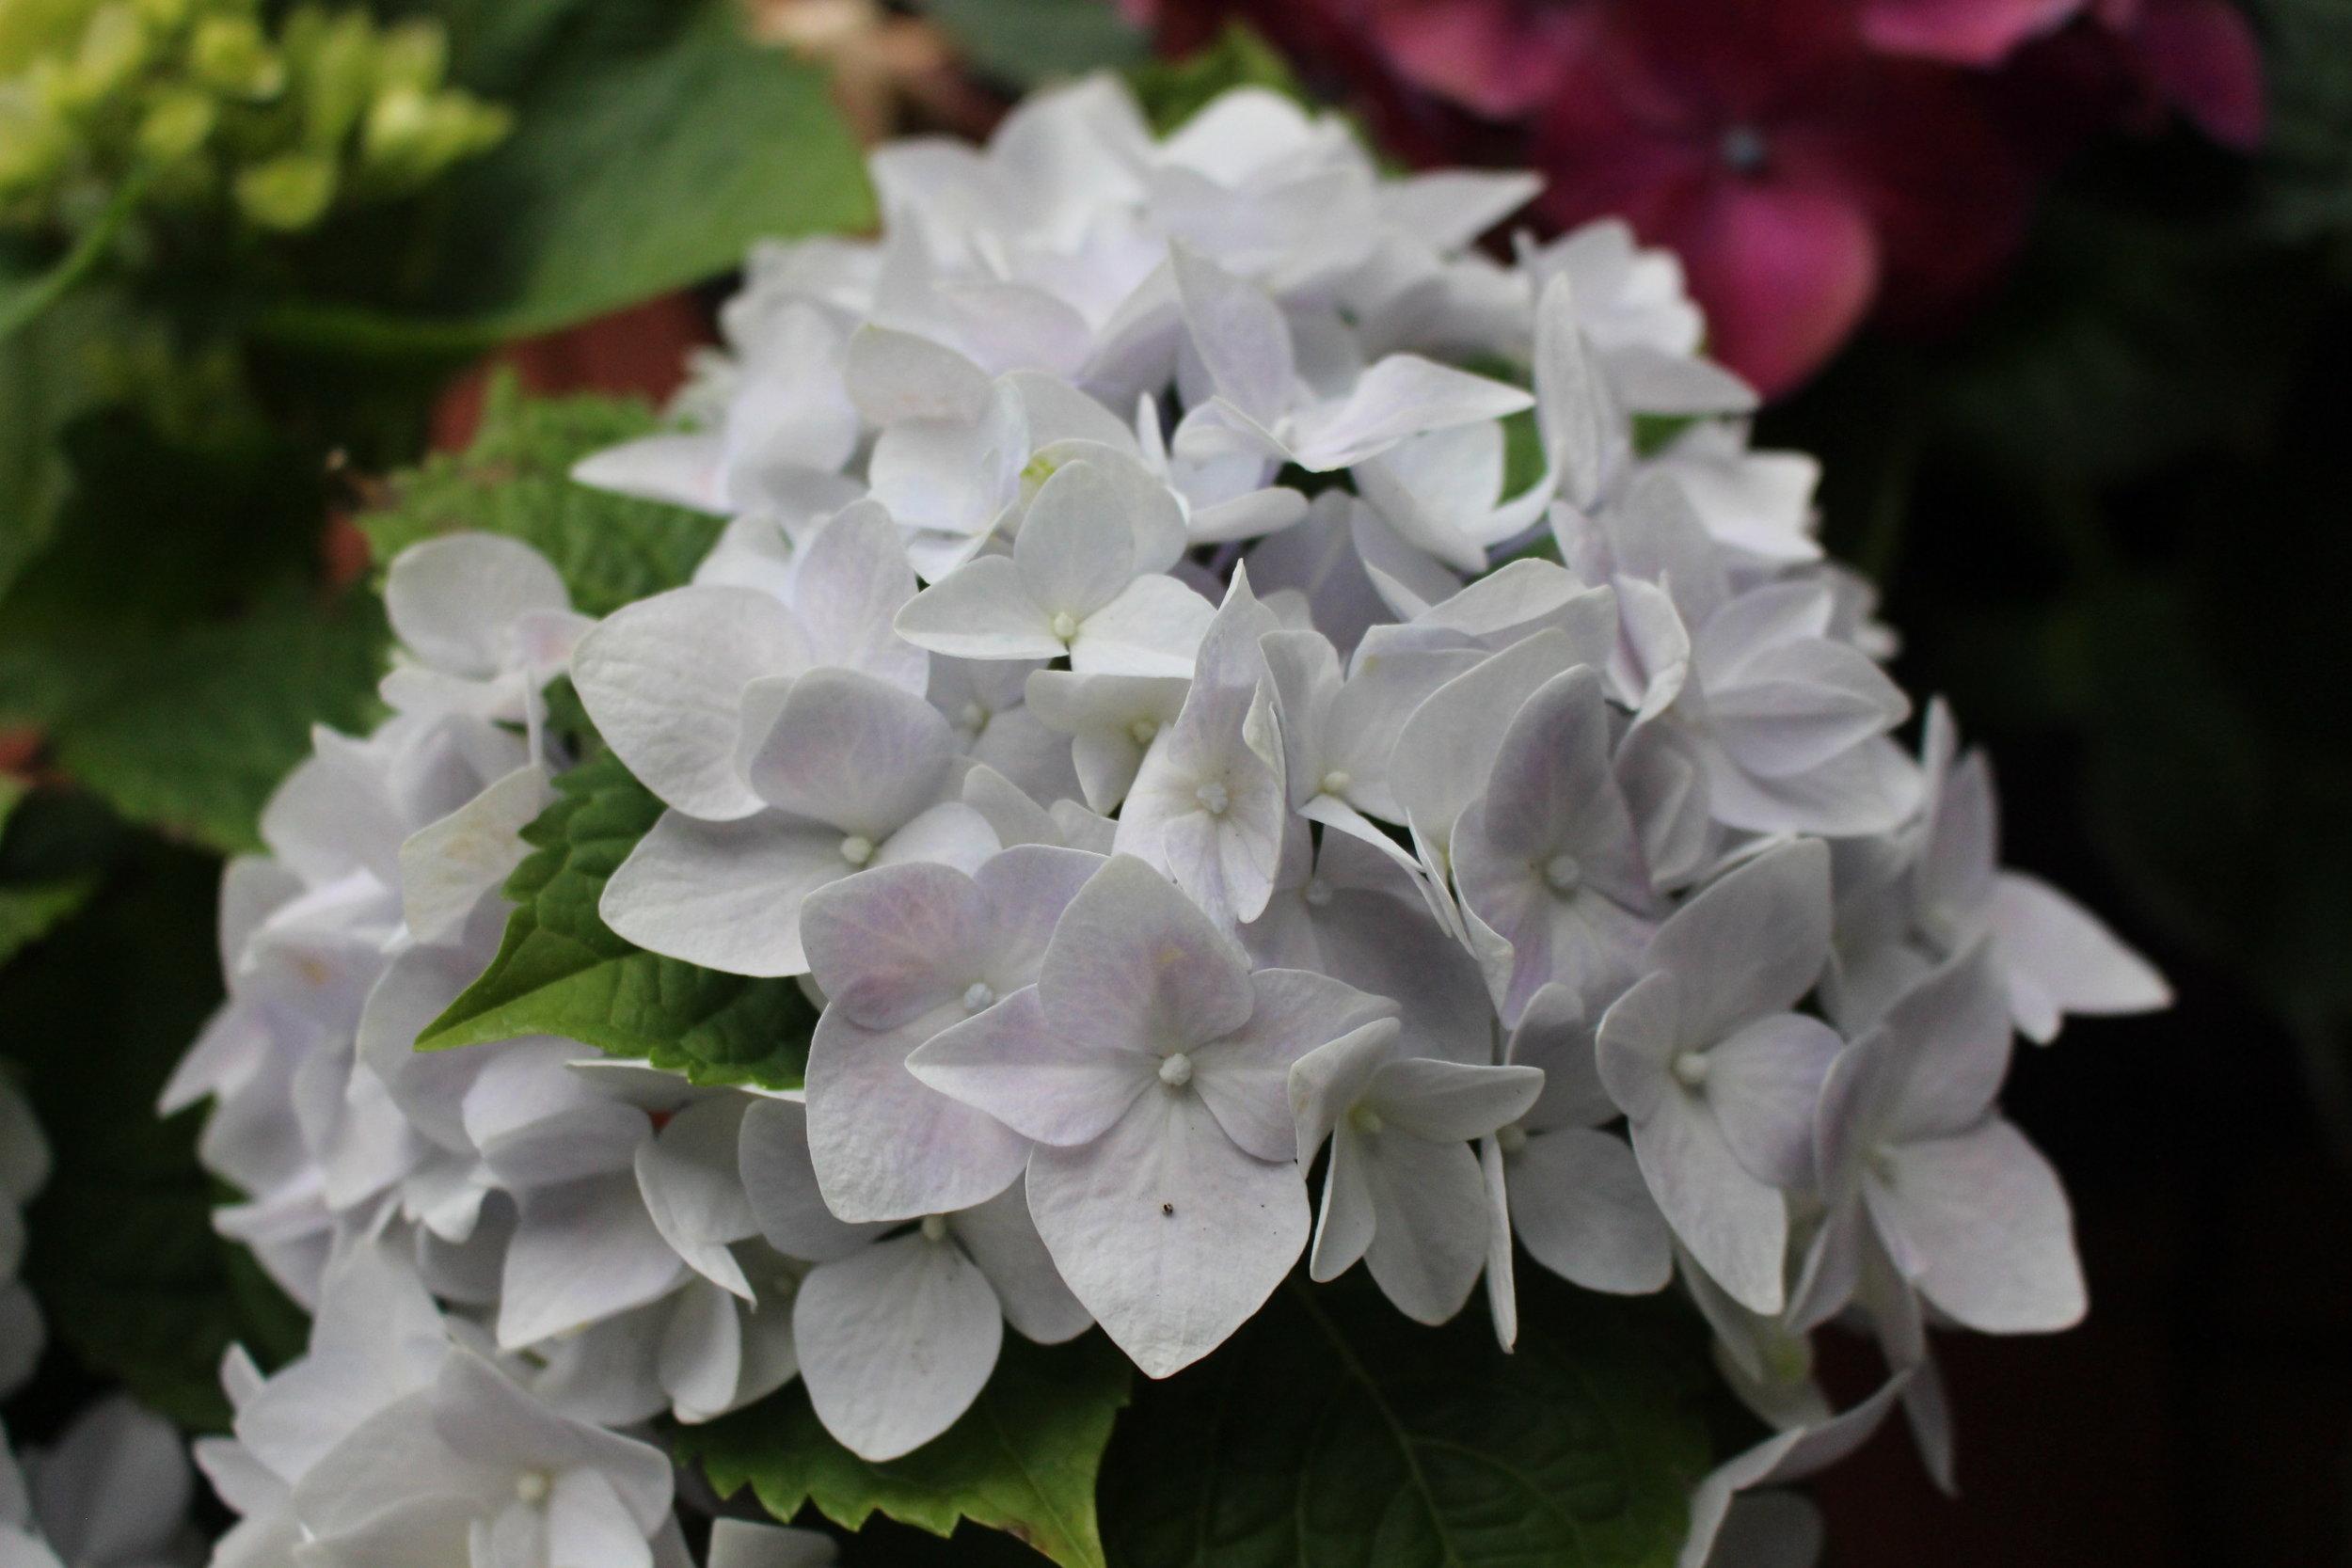 #141 Hydrangea, Hydrangea macrophylla